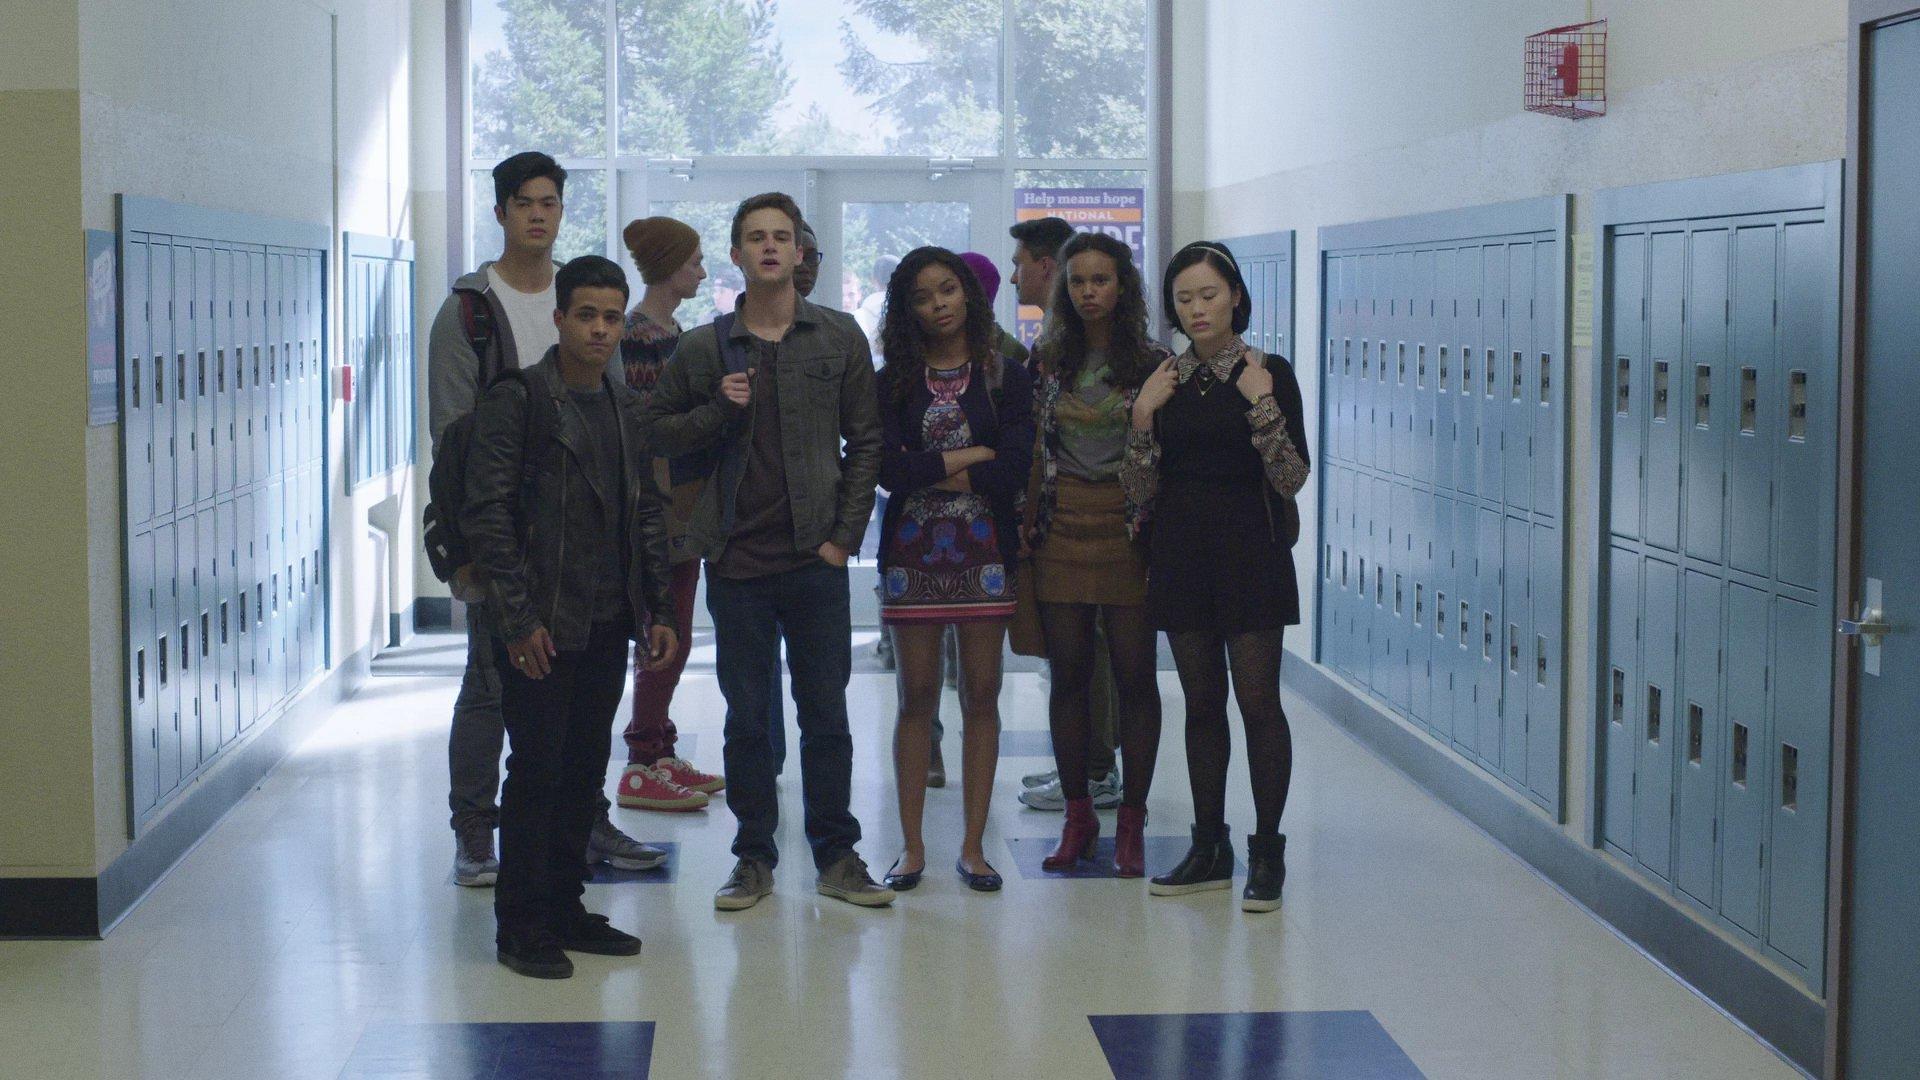 13 reasons why season 2 episode 13 - photo #12